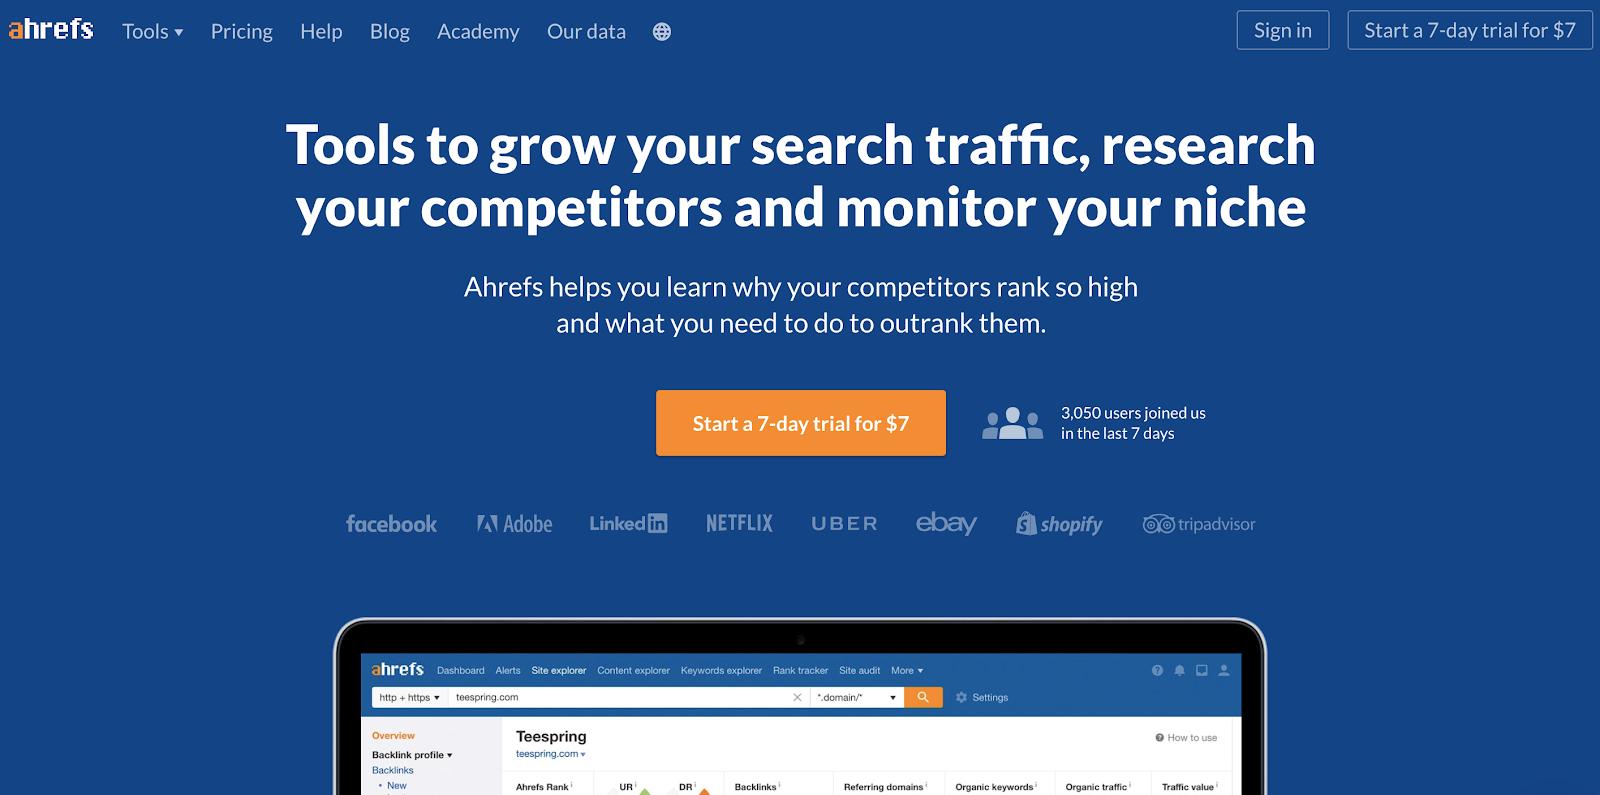 Ahrefs Homepage Screenshot (Blog Layout Examples)